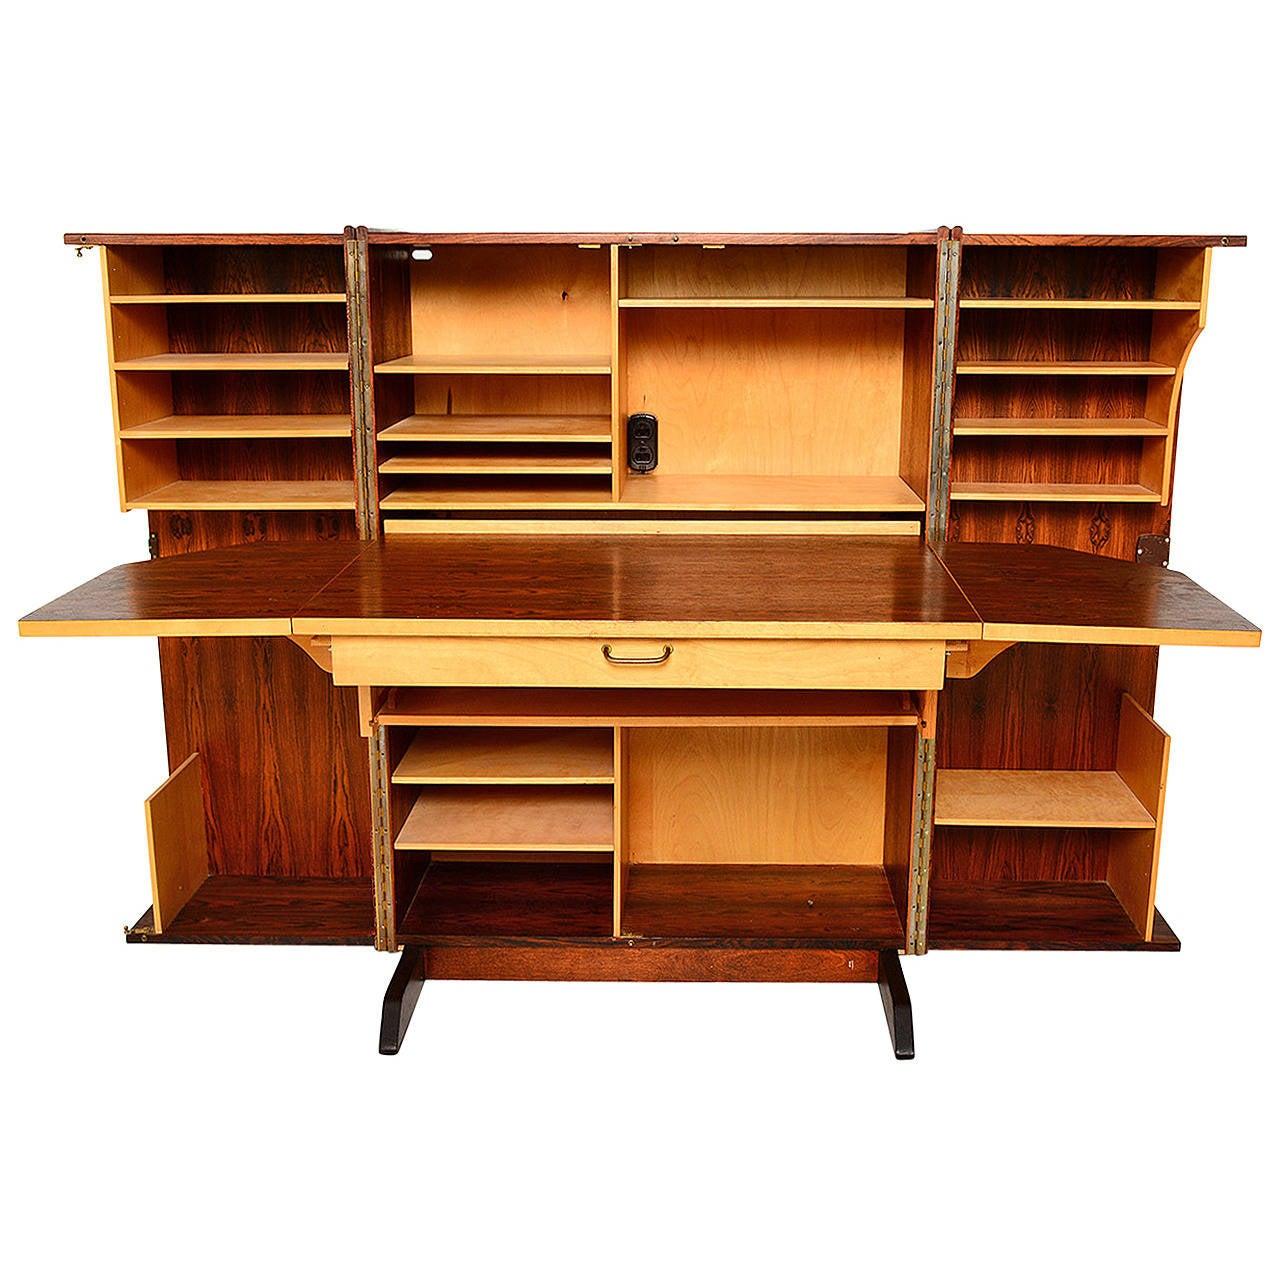 Rosewood Hideaway Desk Cabinet For Sale at 1stdibs